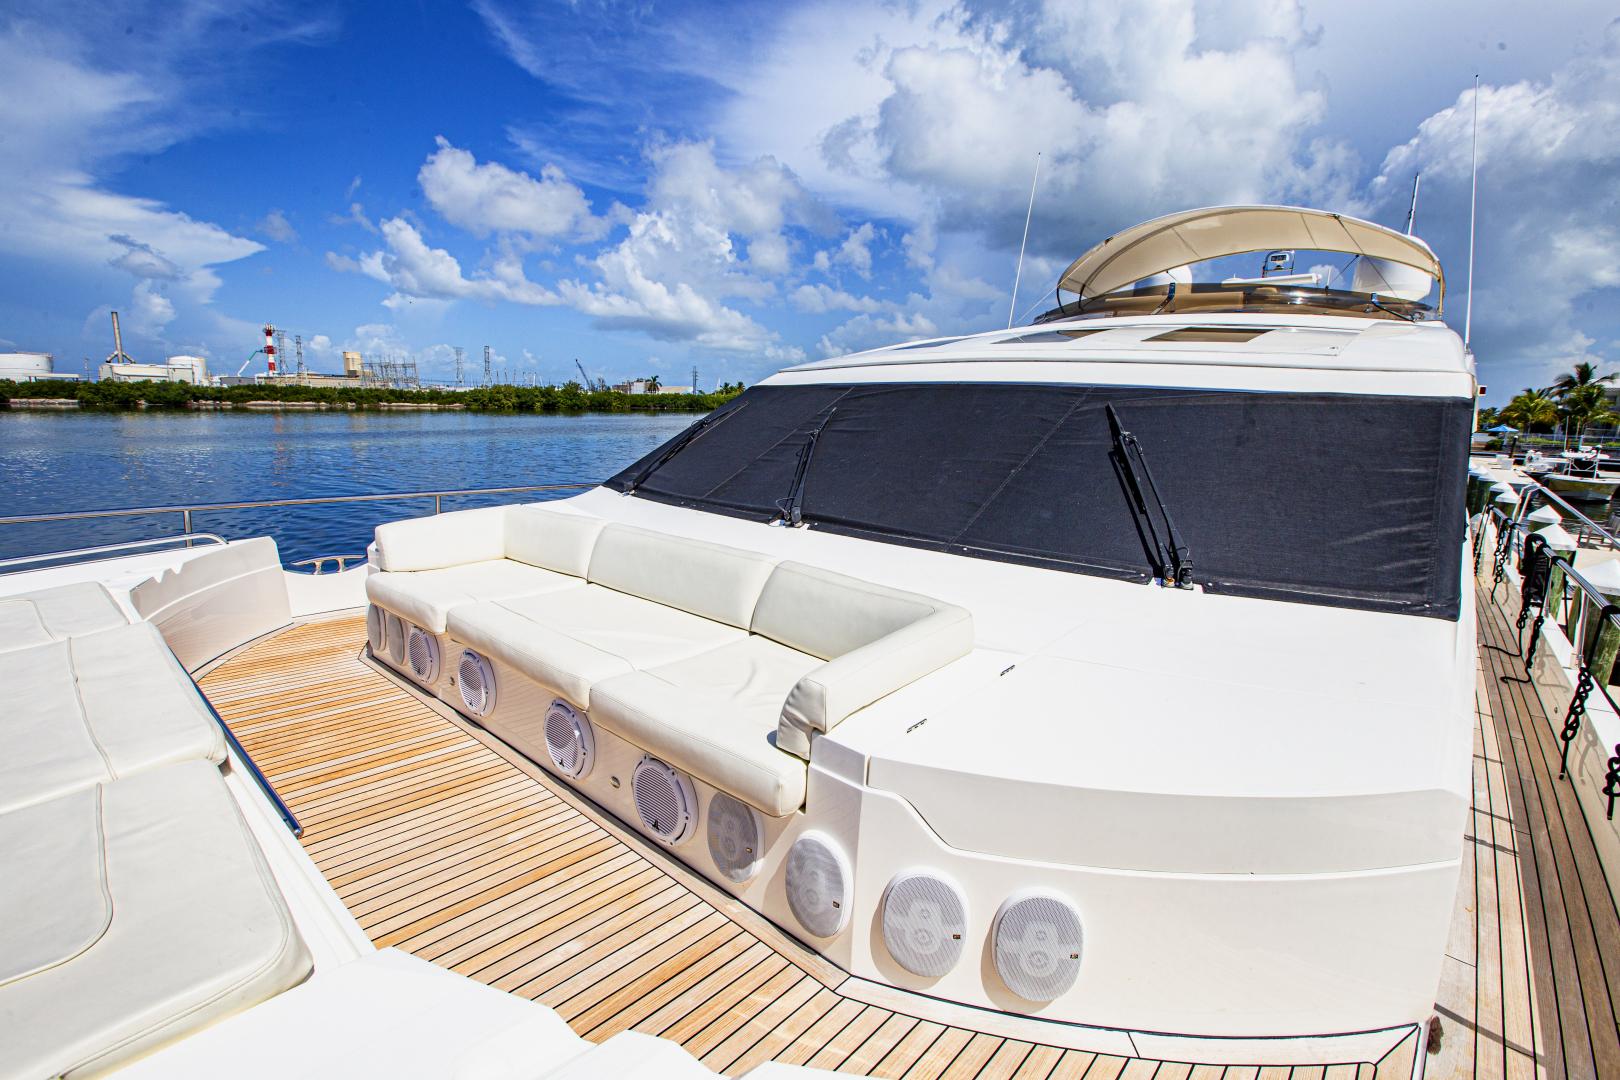 Viking Princess-V85 2009-Las Brisas Fort Lauderdale-Florida-United States-1365523 | Thumbnail